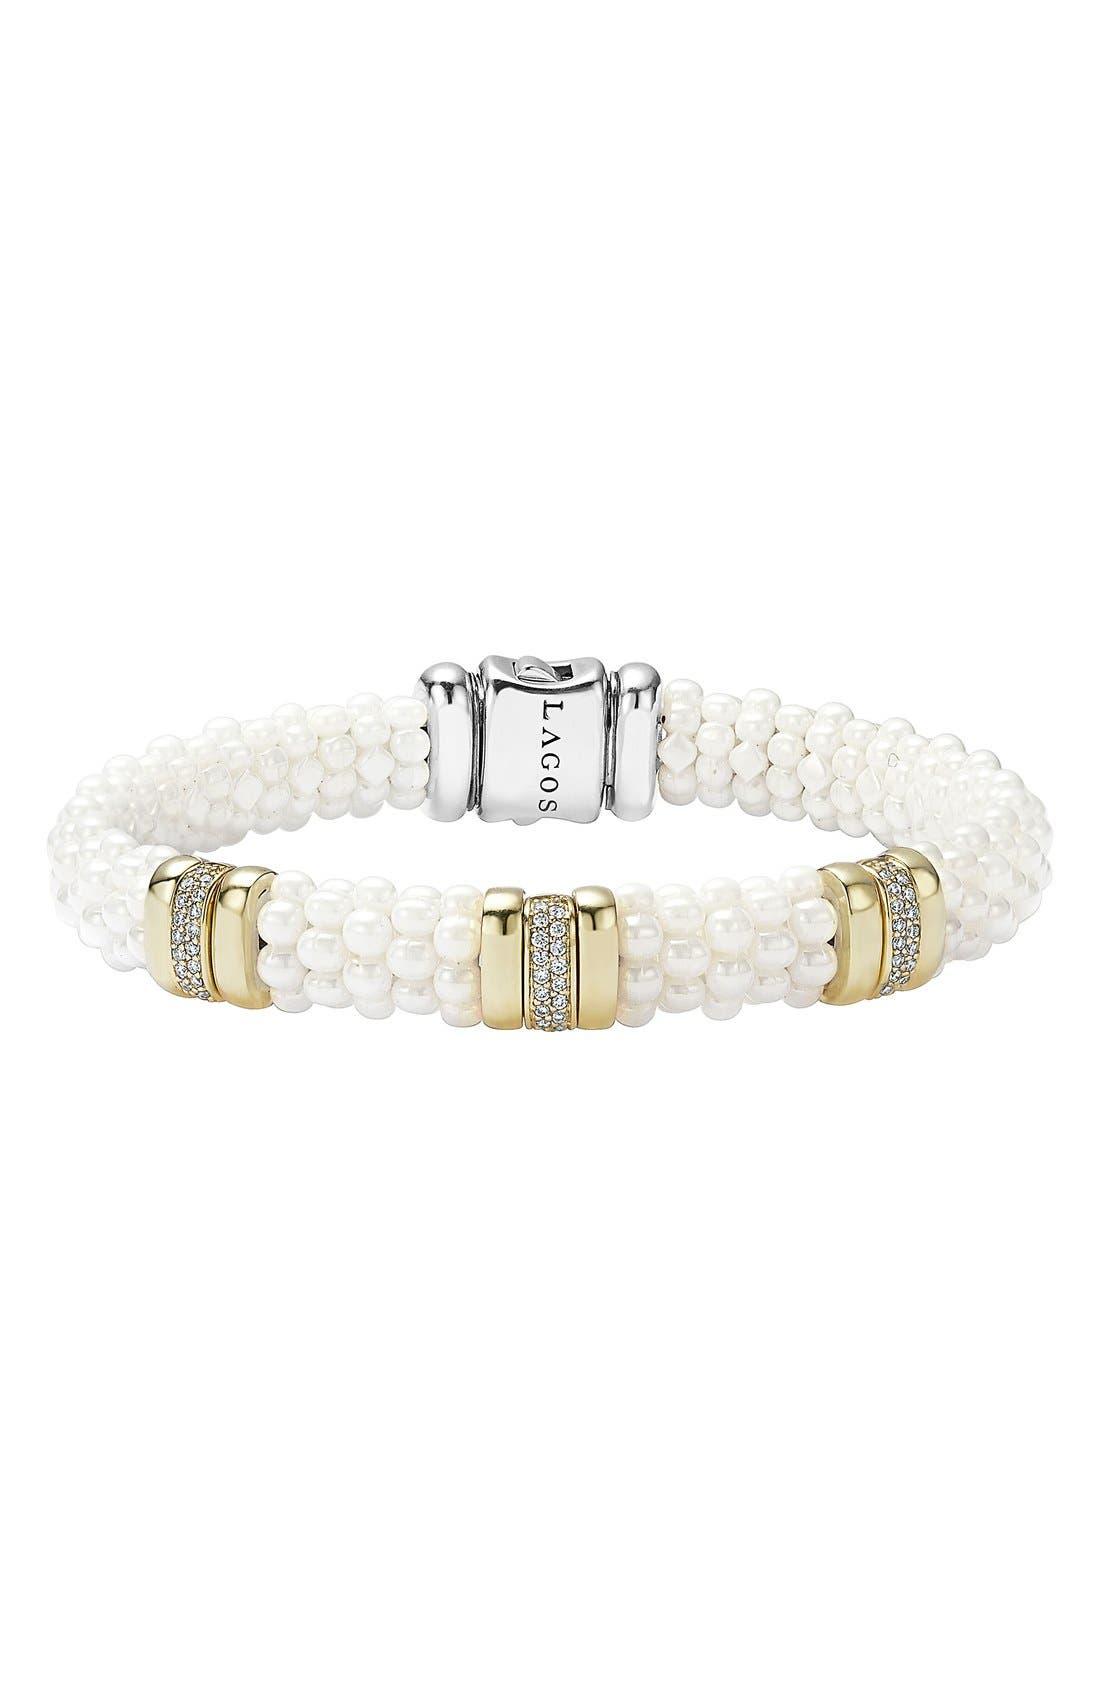 'White Caviar' Three Station Bracelet,                             Main thumbnail 1, color,                             WHITE CAVIAR/ YELLOW GOLD